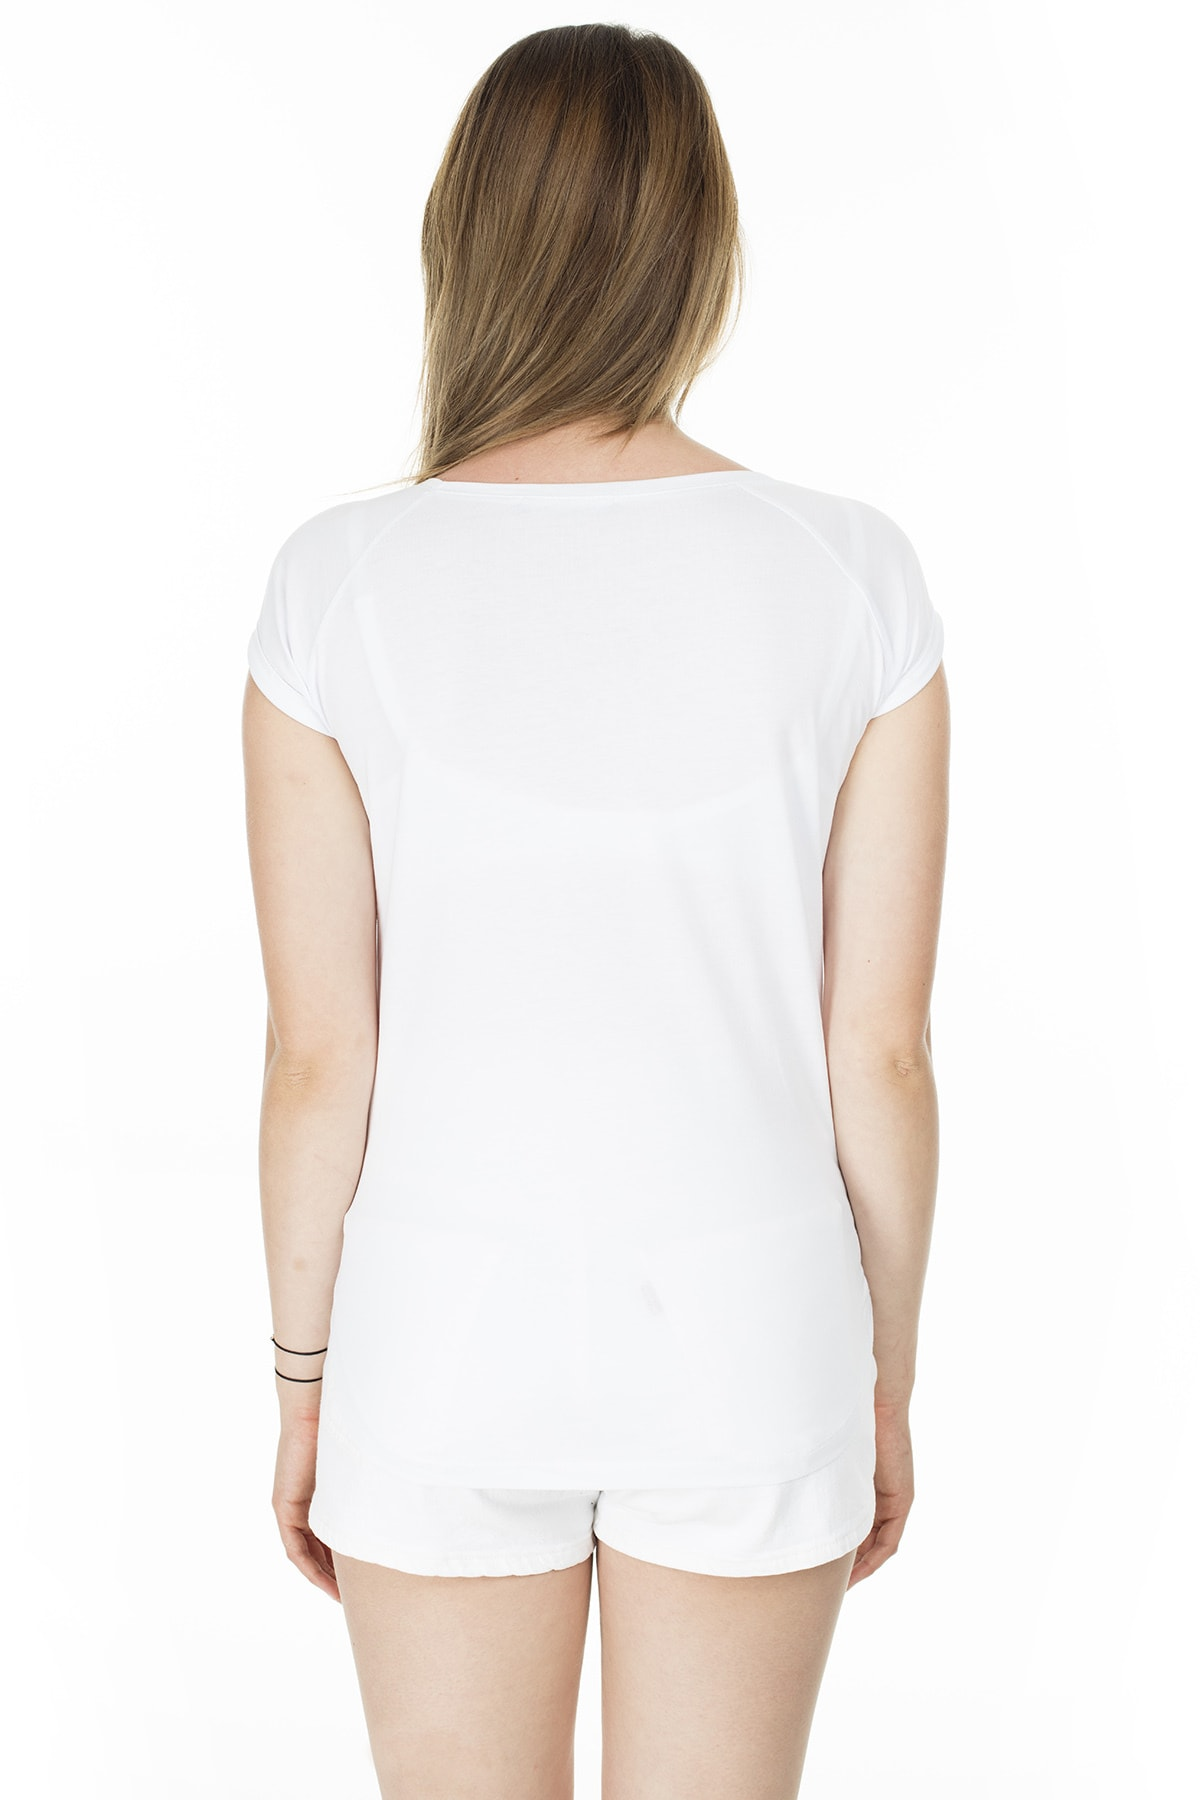 Lela Yazı Detaylı Havuz Yaka T Shirt KADIN T SHİRT 5411011 2